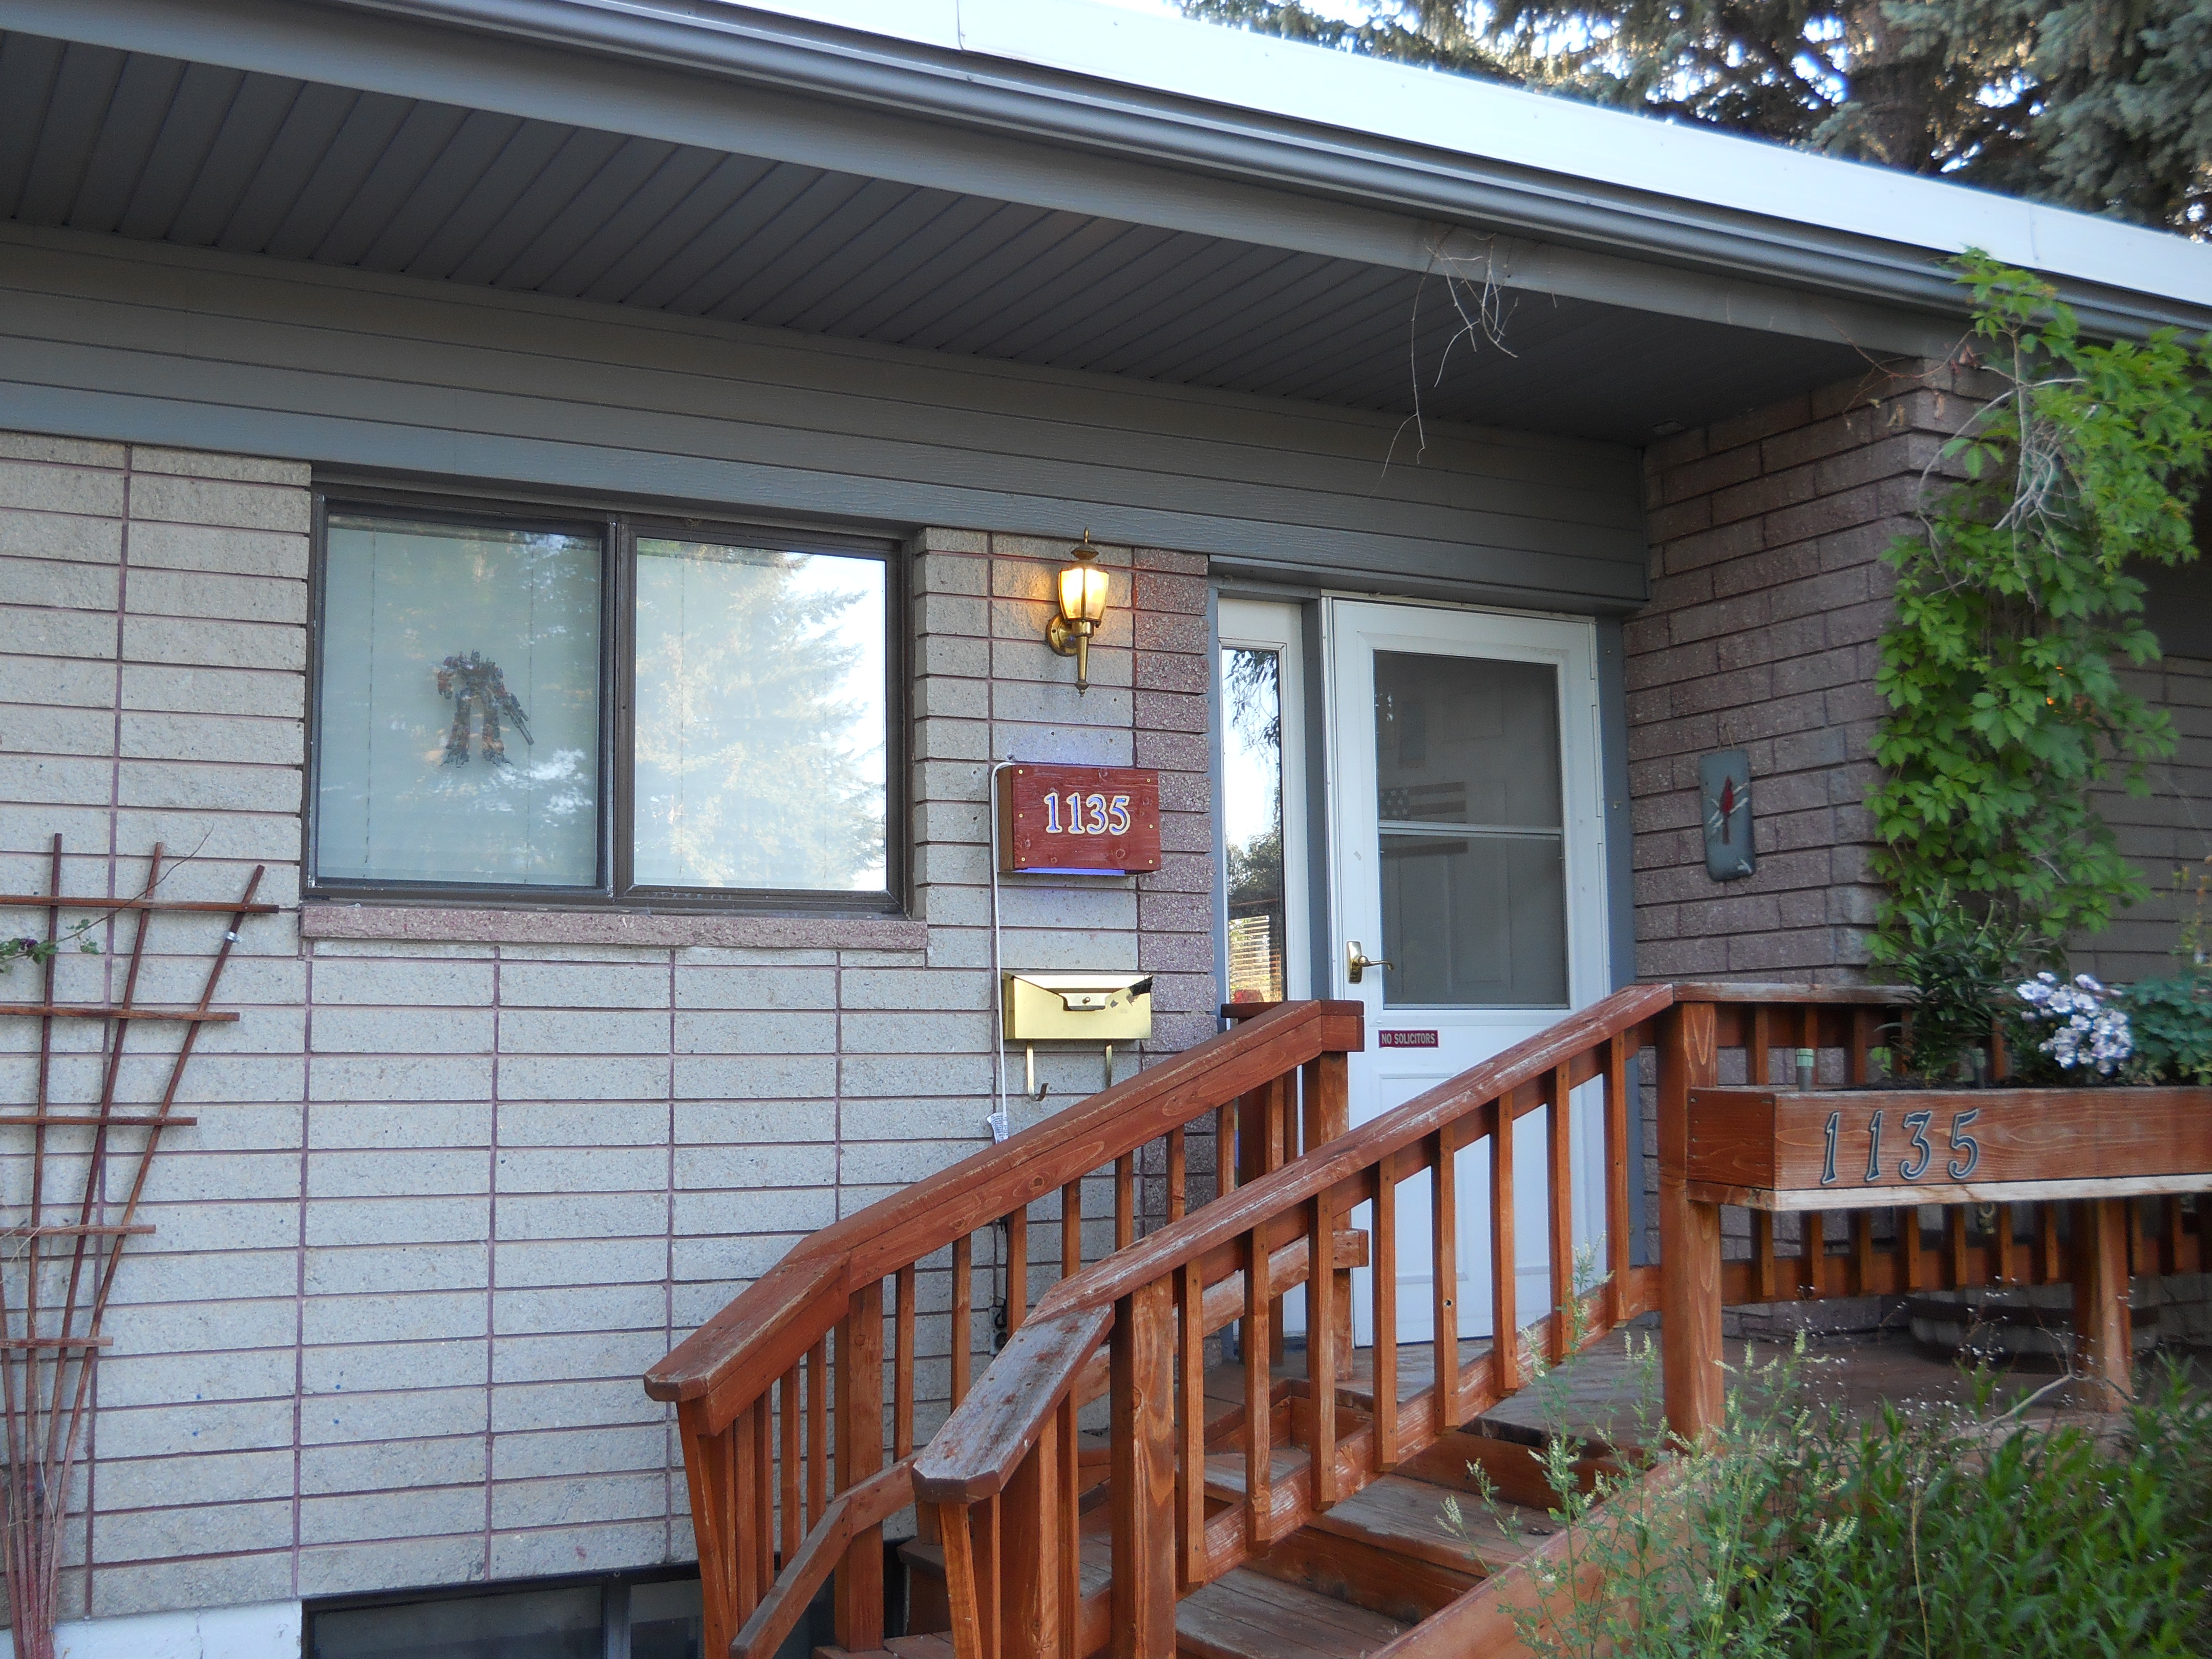 Lighted House Address